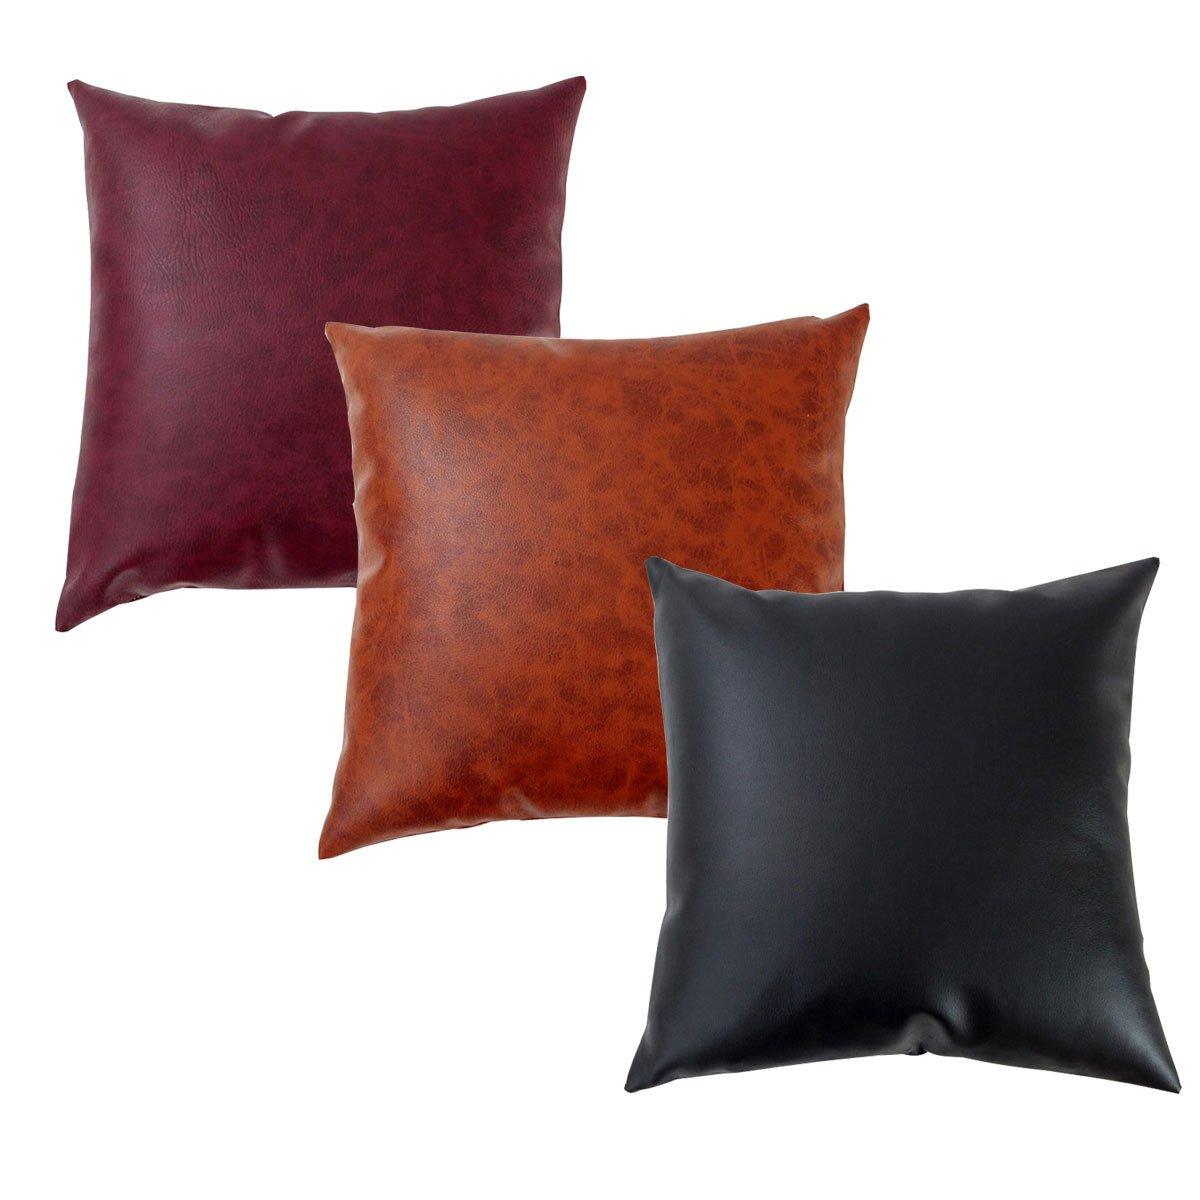 LAZAMYASA Pack of 2 Sofa Pillowcase Soft Batik Effect PU Faux Leather Throw Pillowcase Home Decorative Chairs Cushion Both Side,2PCS